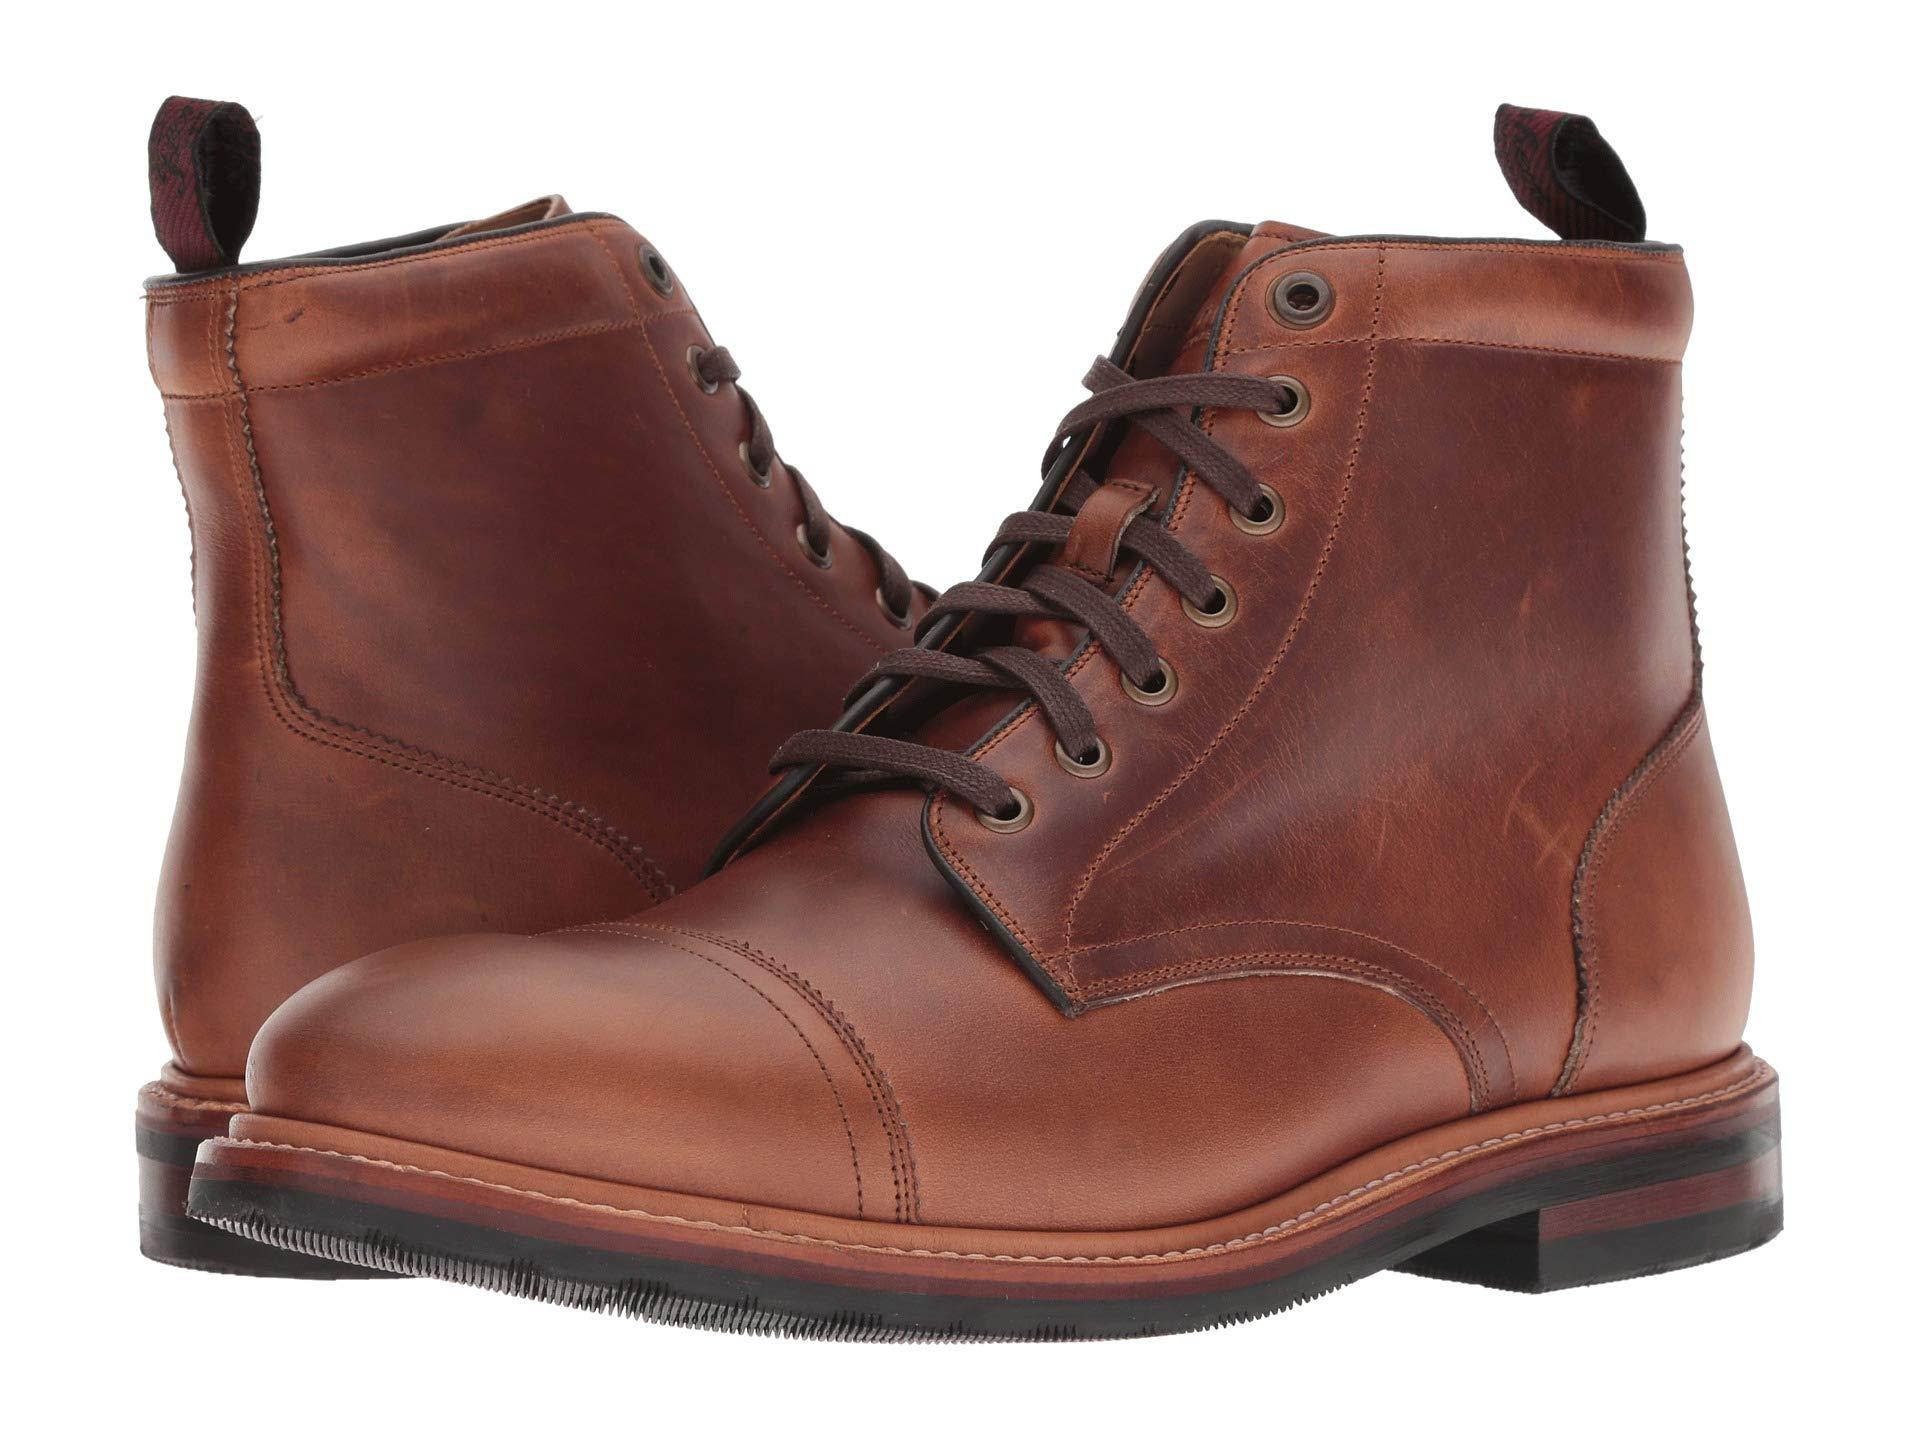 Florsheim Toe Saddle Foundry Tan Boot Lace up Horween Cap qOwFRCrq